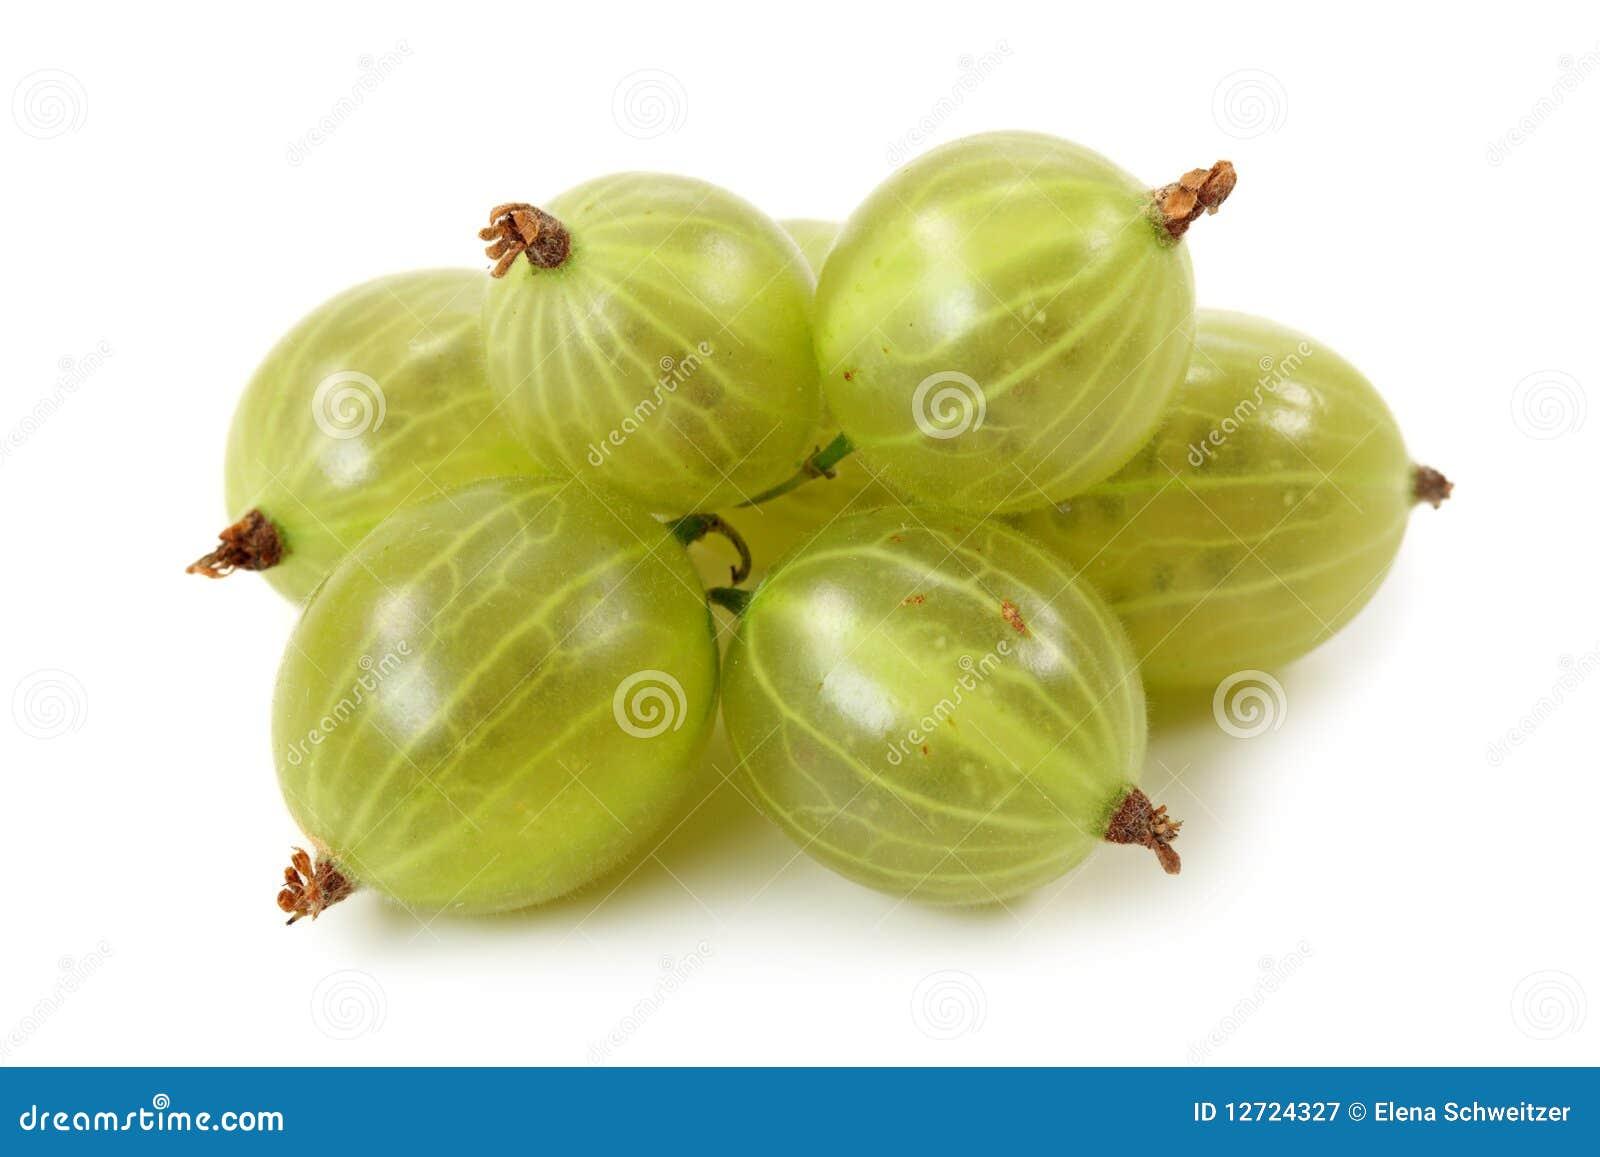 Groseilles à maquereau vertes